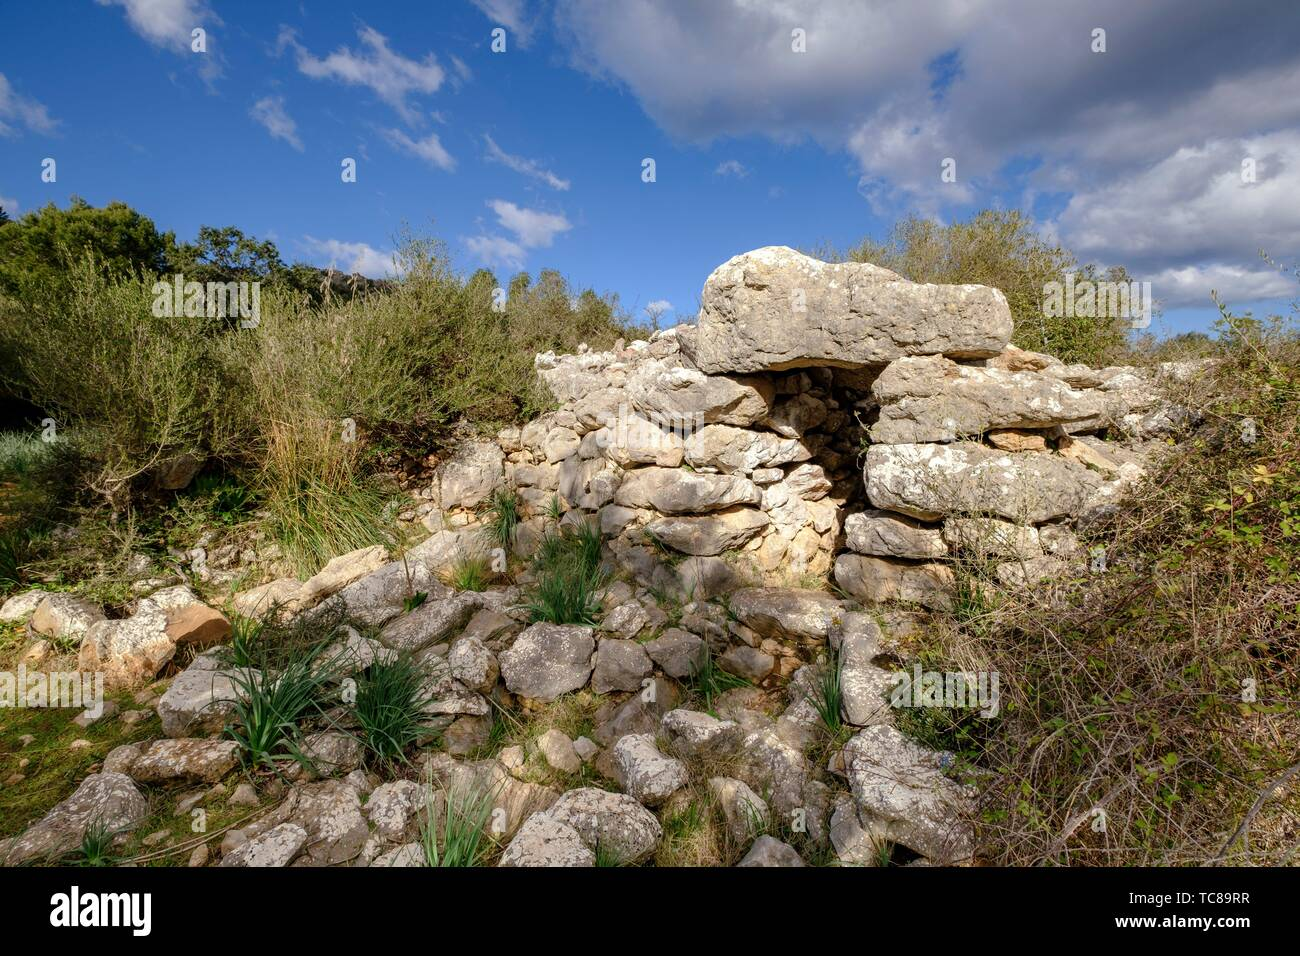 Talaiot, Son Ferrandell-Son Oleza, I milenio a C. , Valldemossa, Mallorca, Balearic islands, spain. - Stock Image